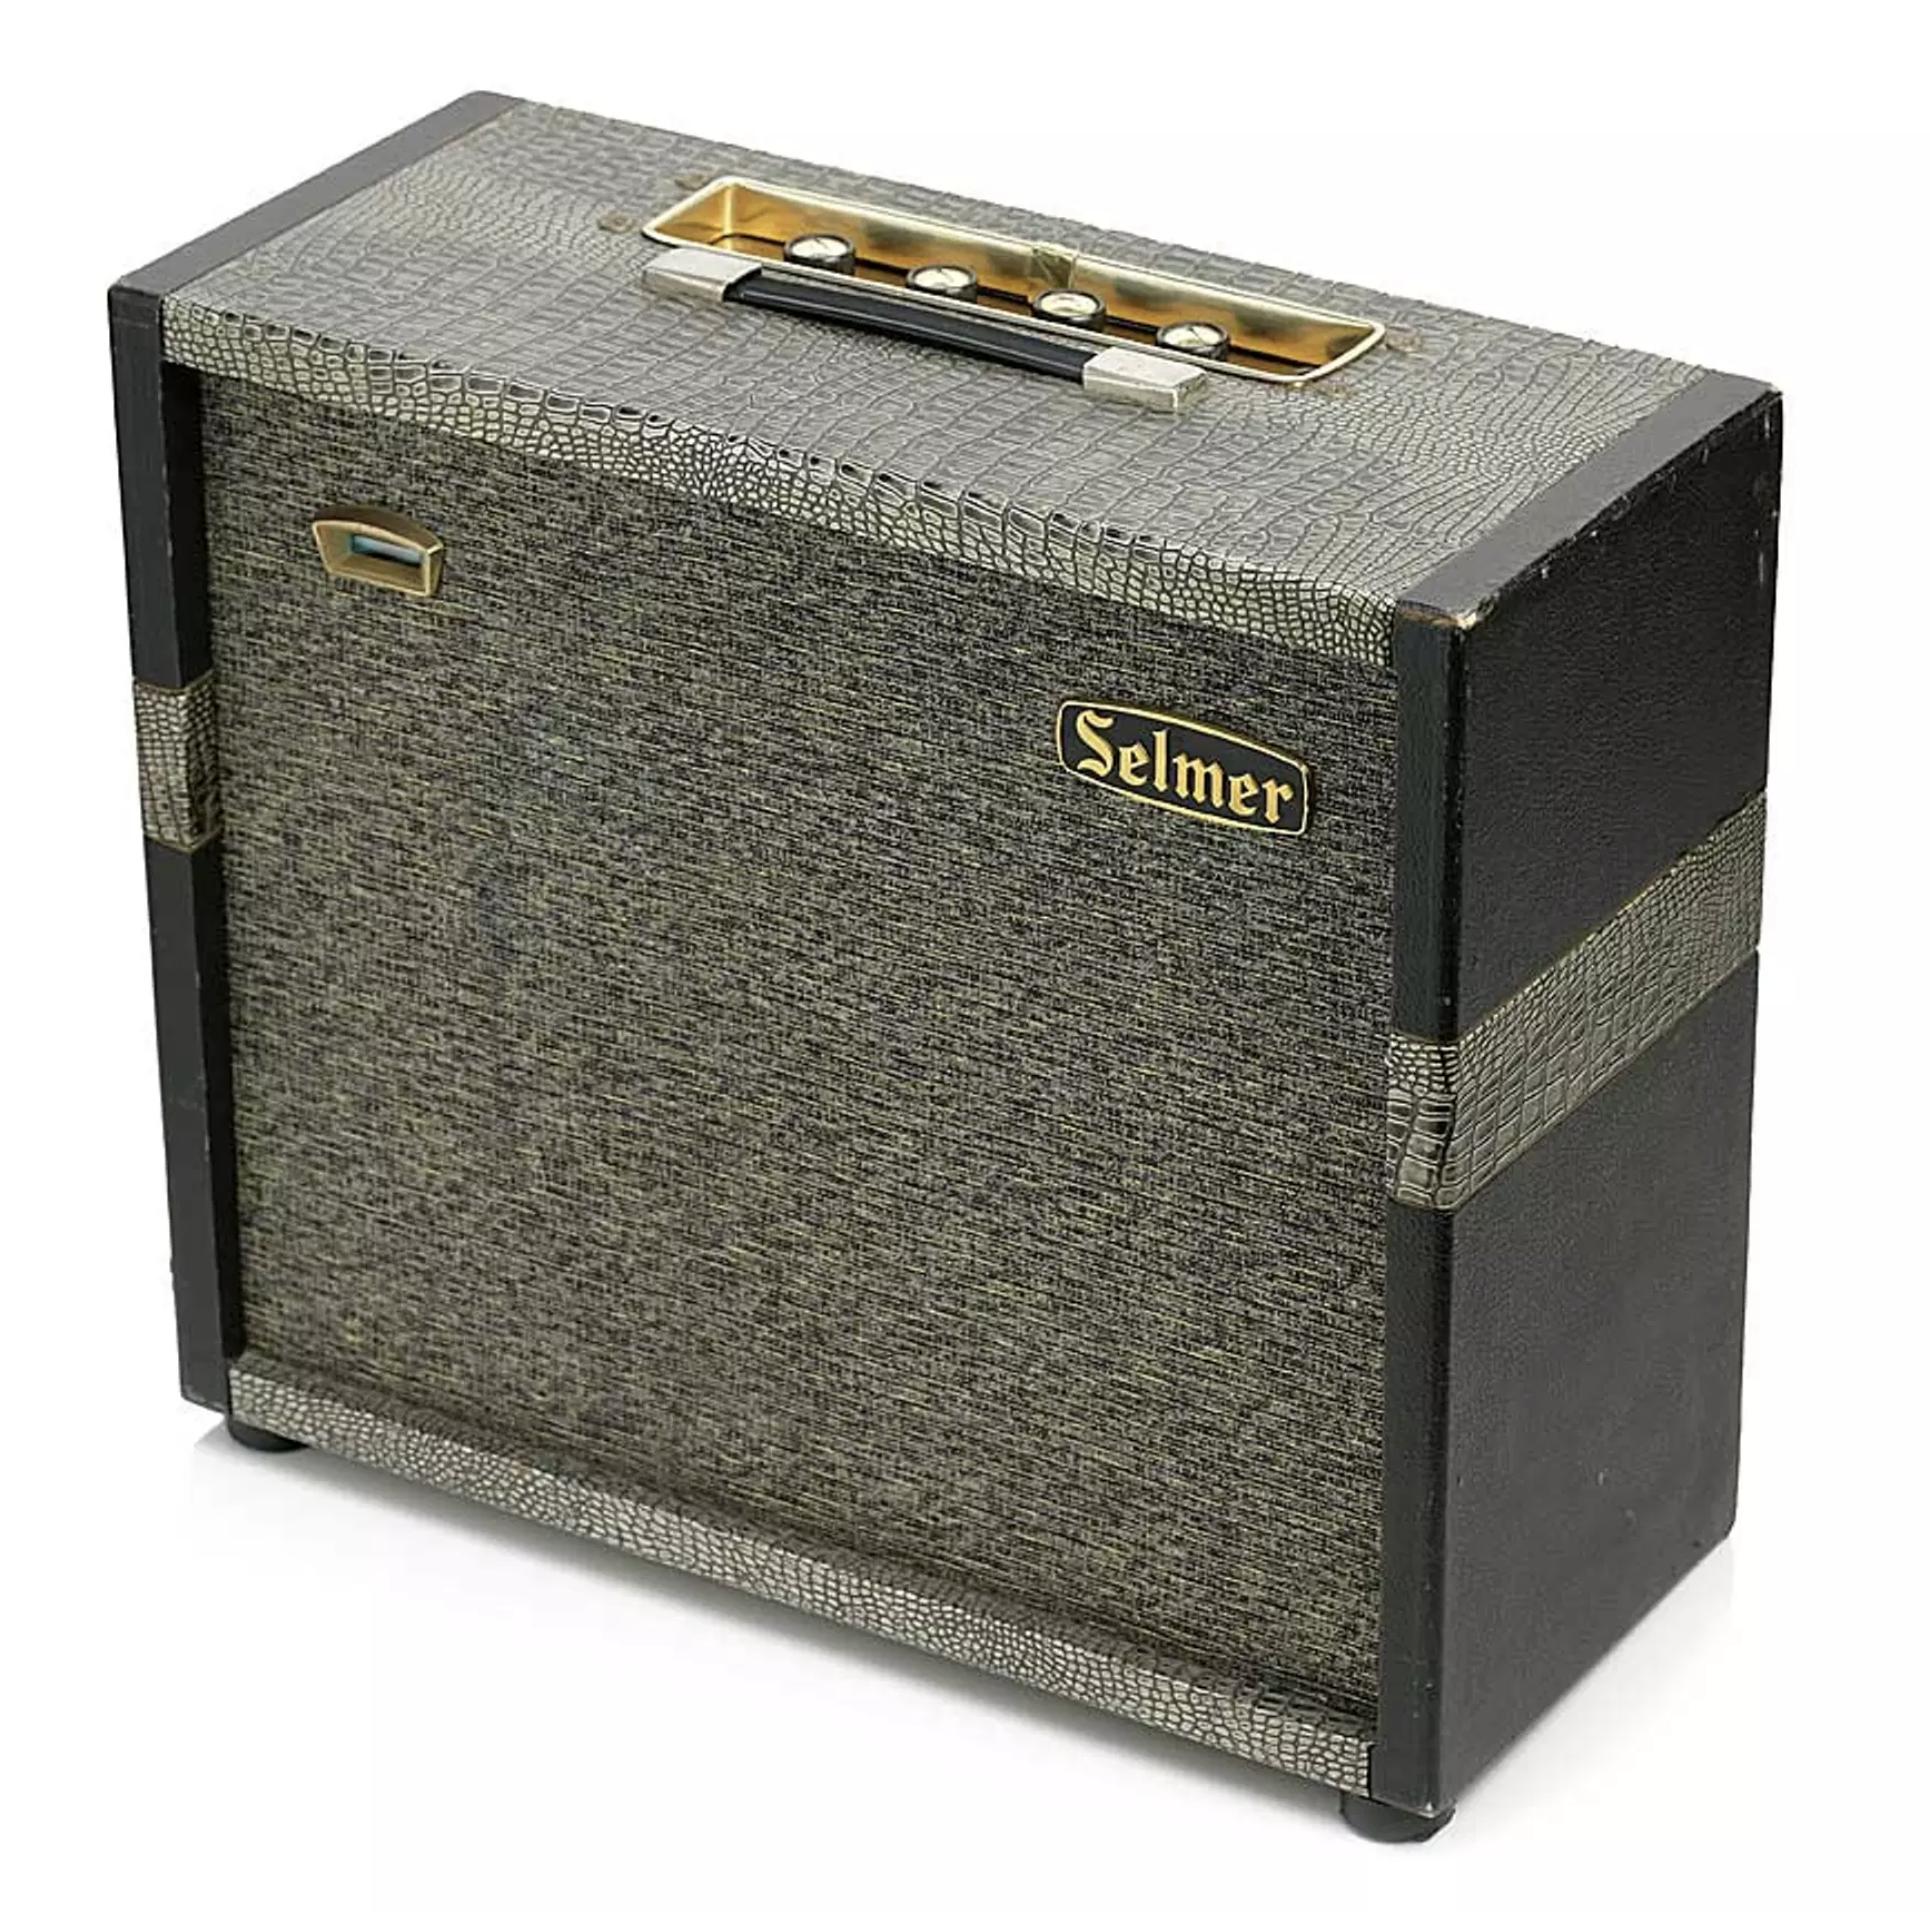 Best valves for Selmer Truvoice Concorde 8 amplifier